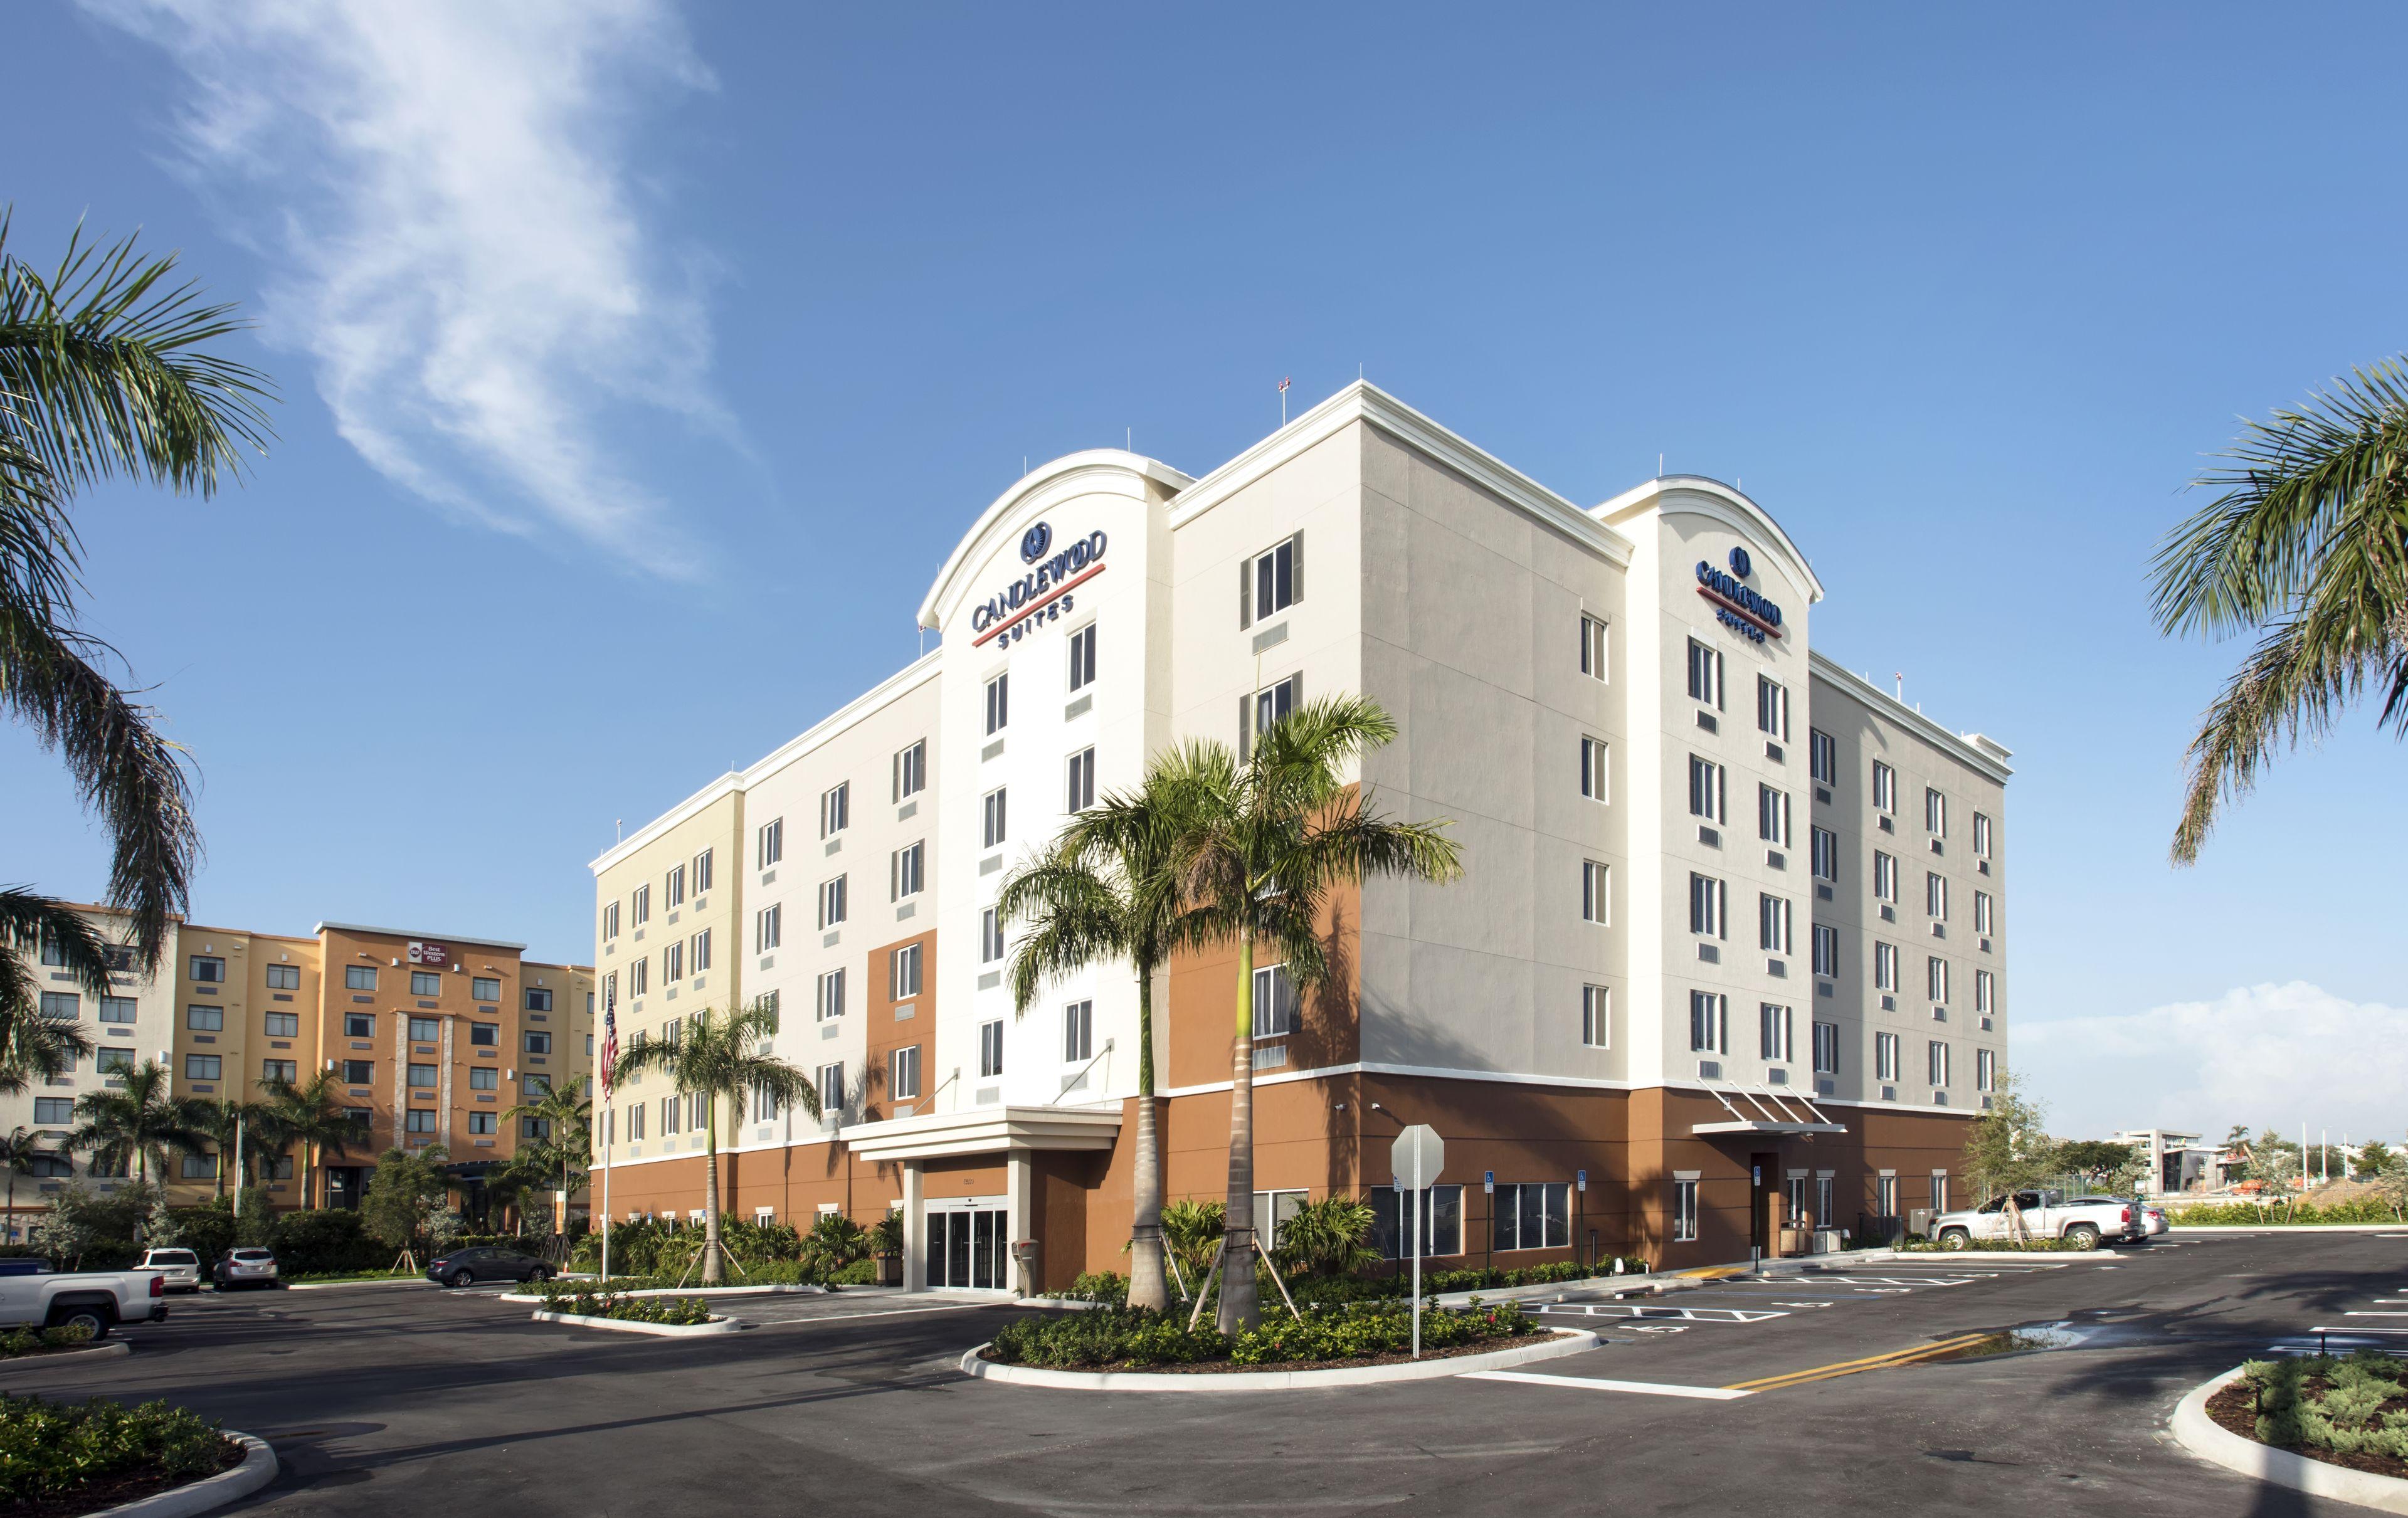 Candlewood Suites Miami Executive Arpt Kendall